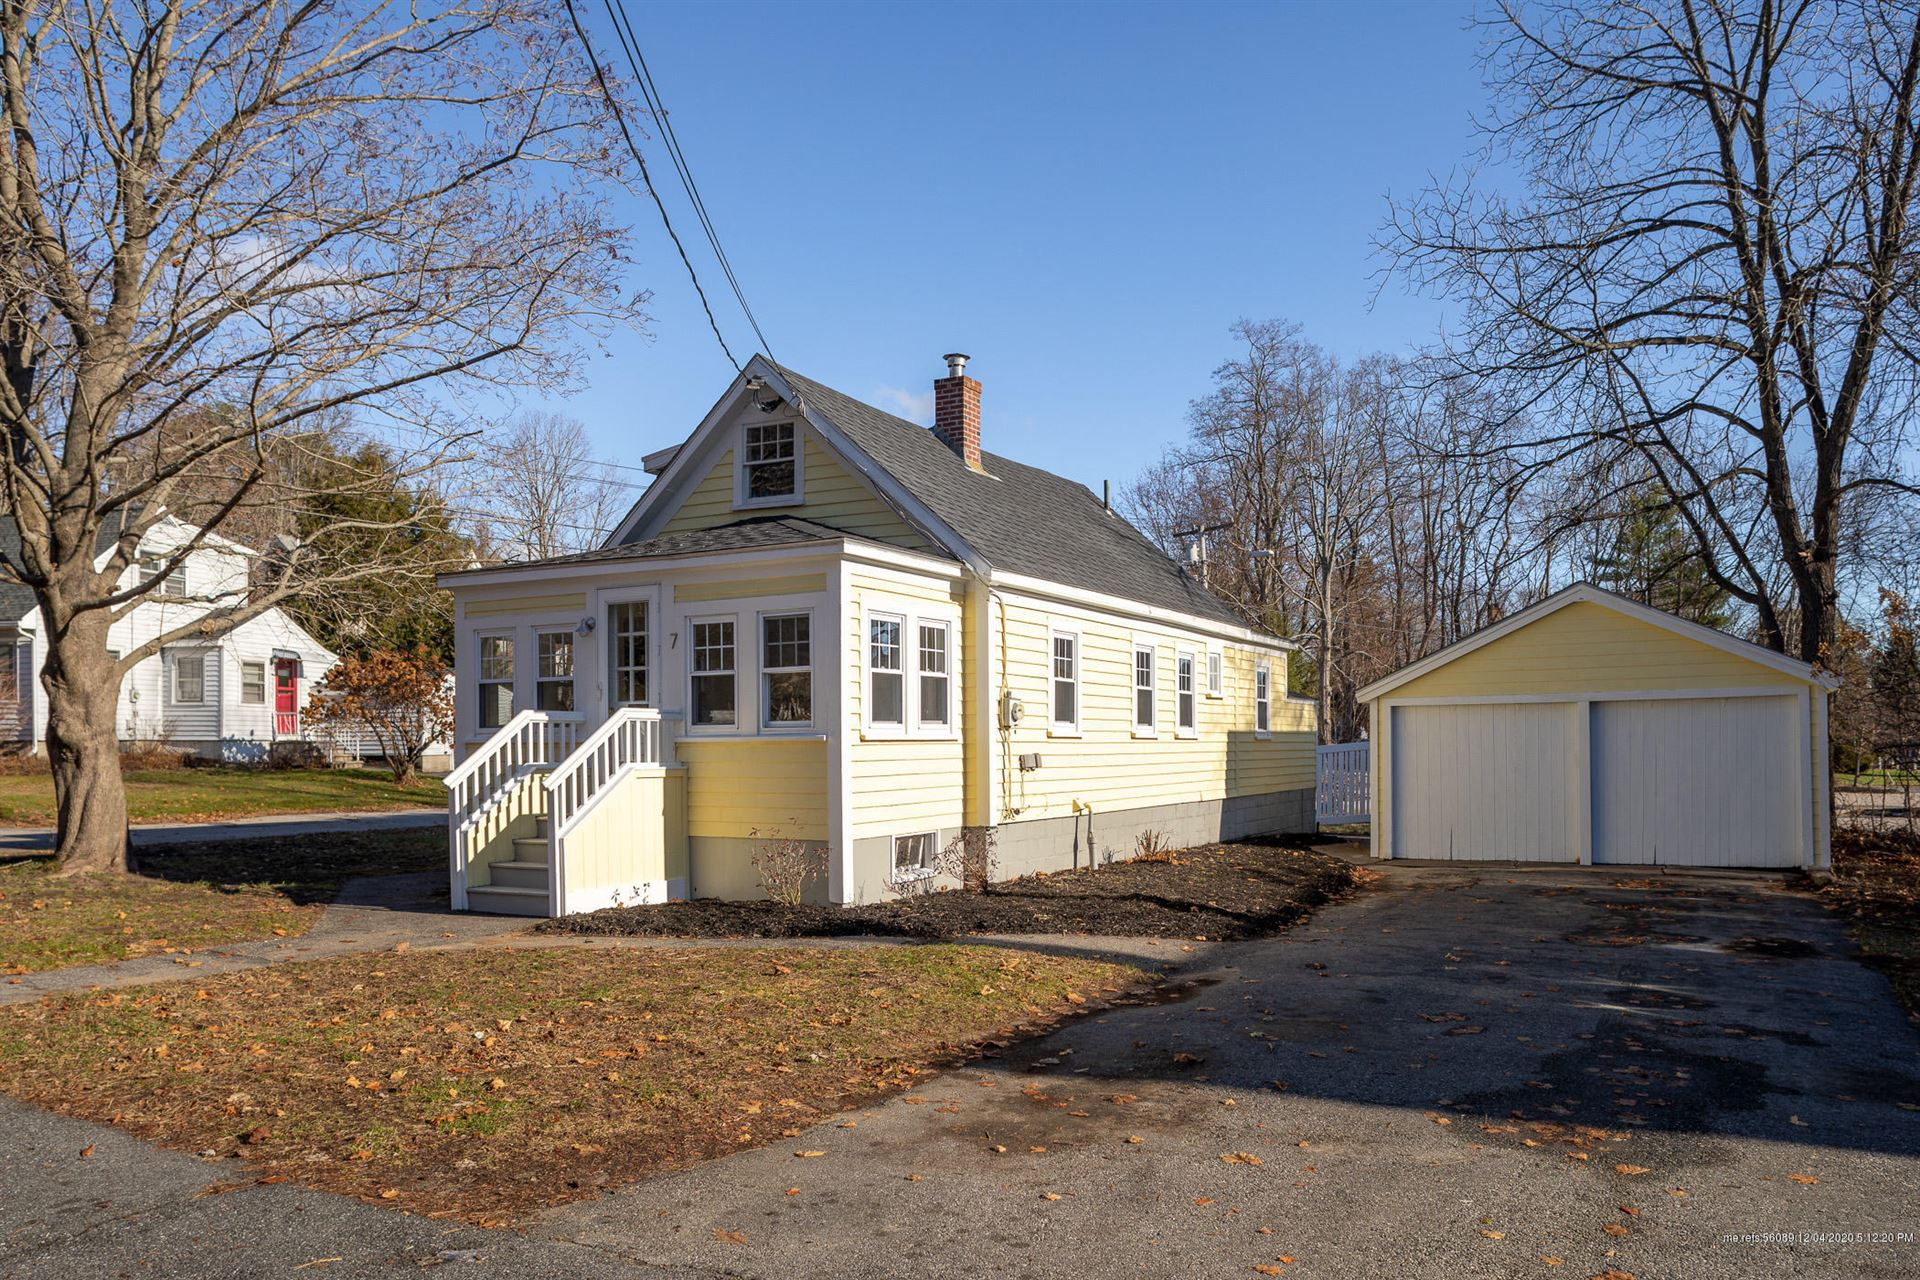 Photo of 7 Parsons Street, Kennebunk, ME 04043 (MLS # 1477598)